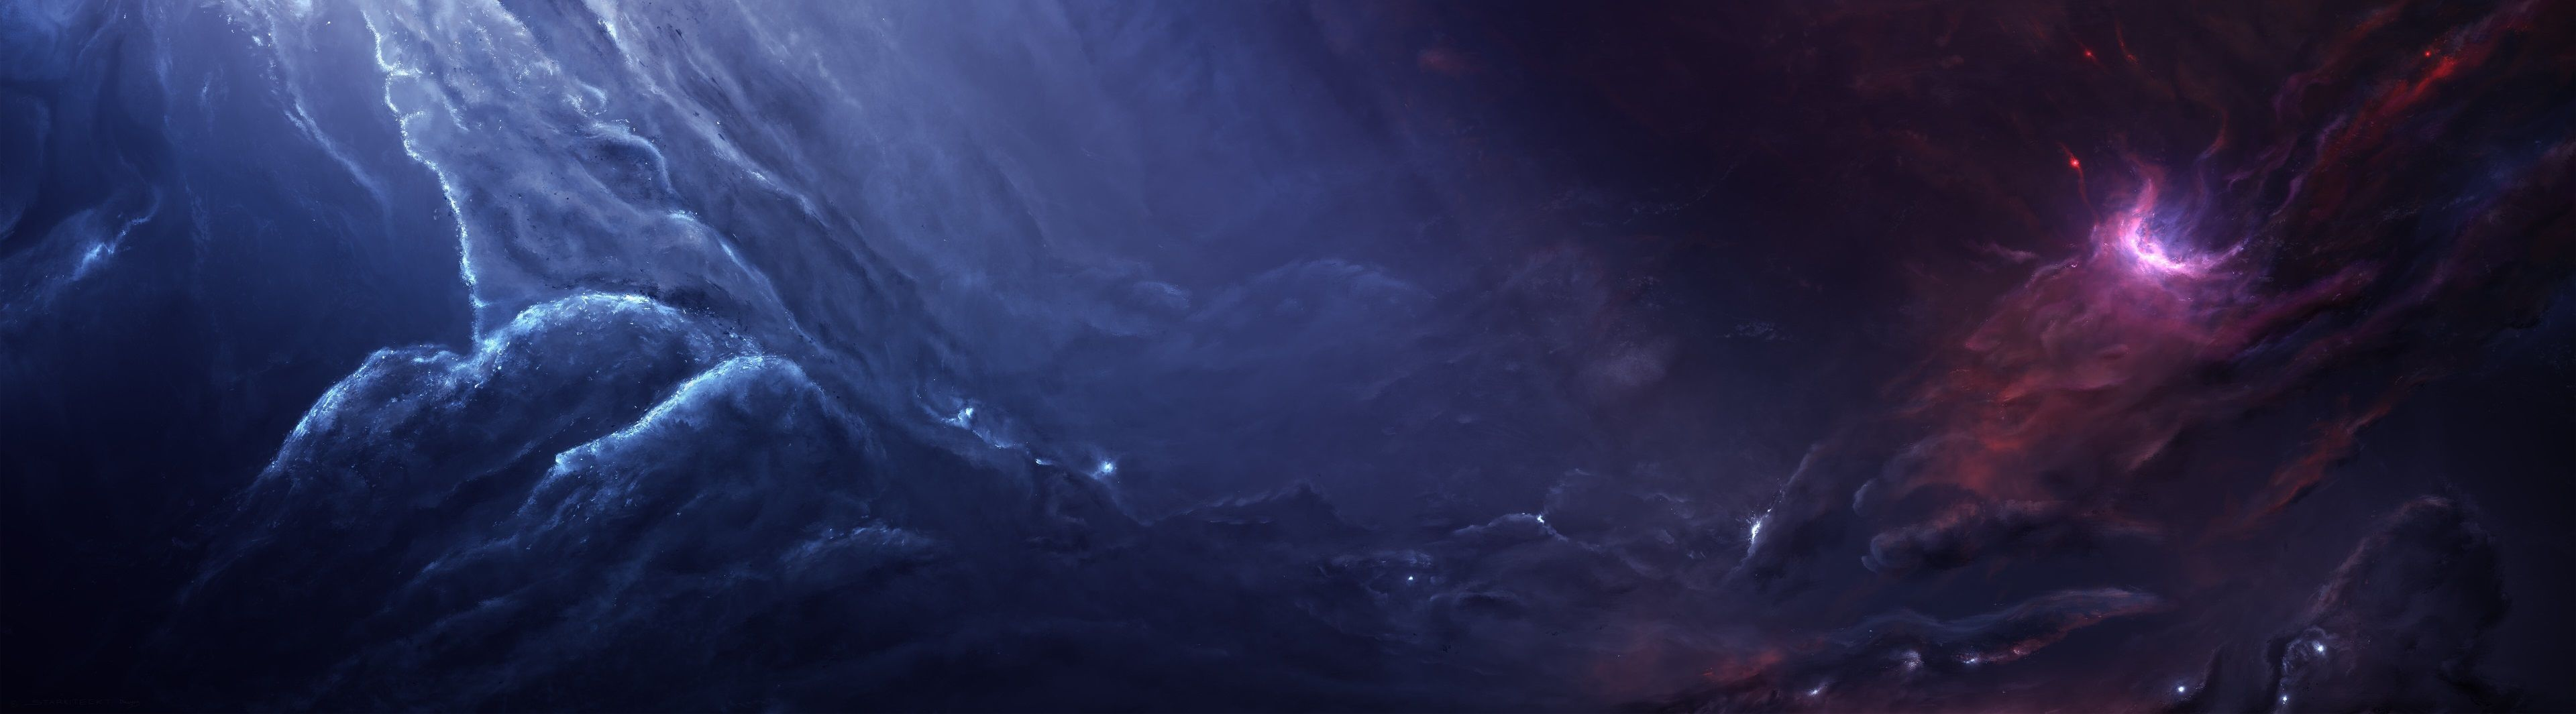 3840x1065 horsehead nebula 4k windows wallpaper for